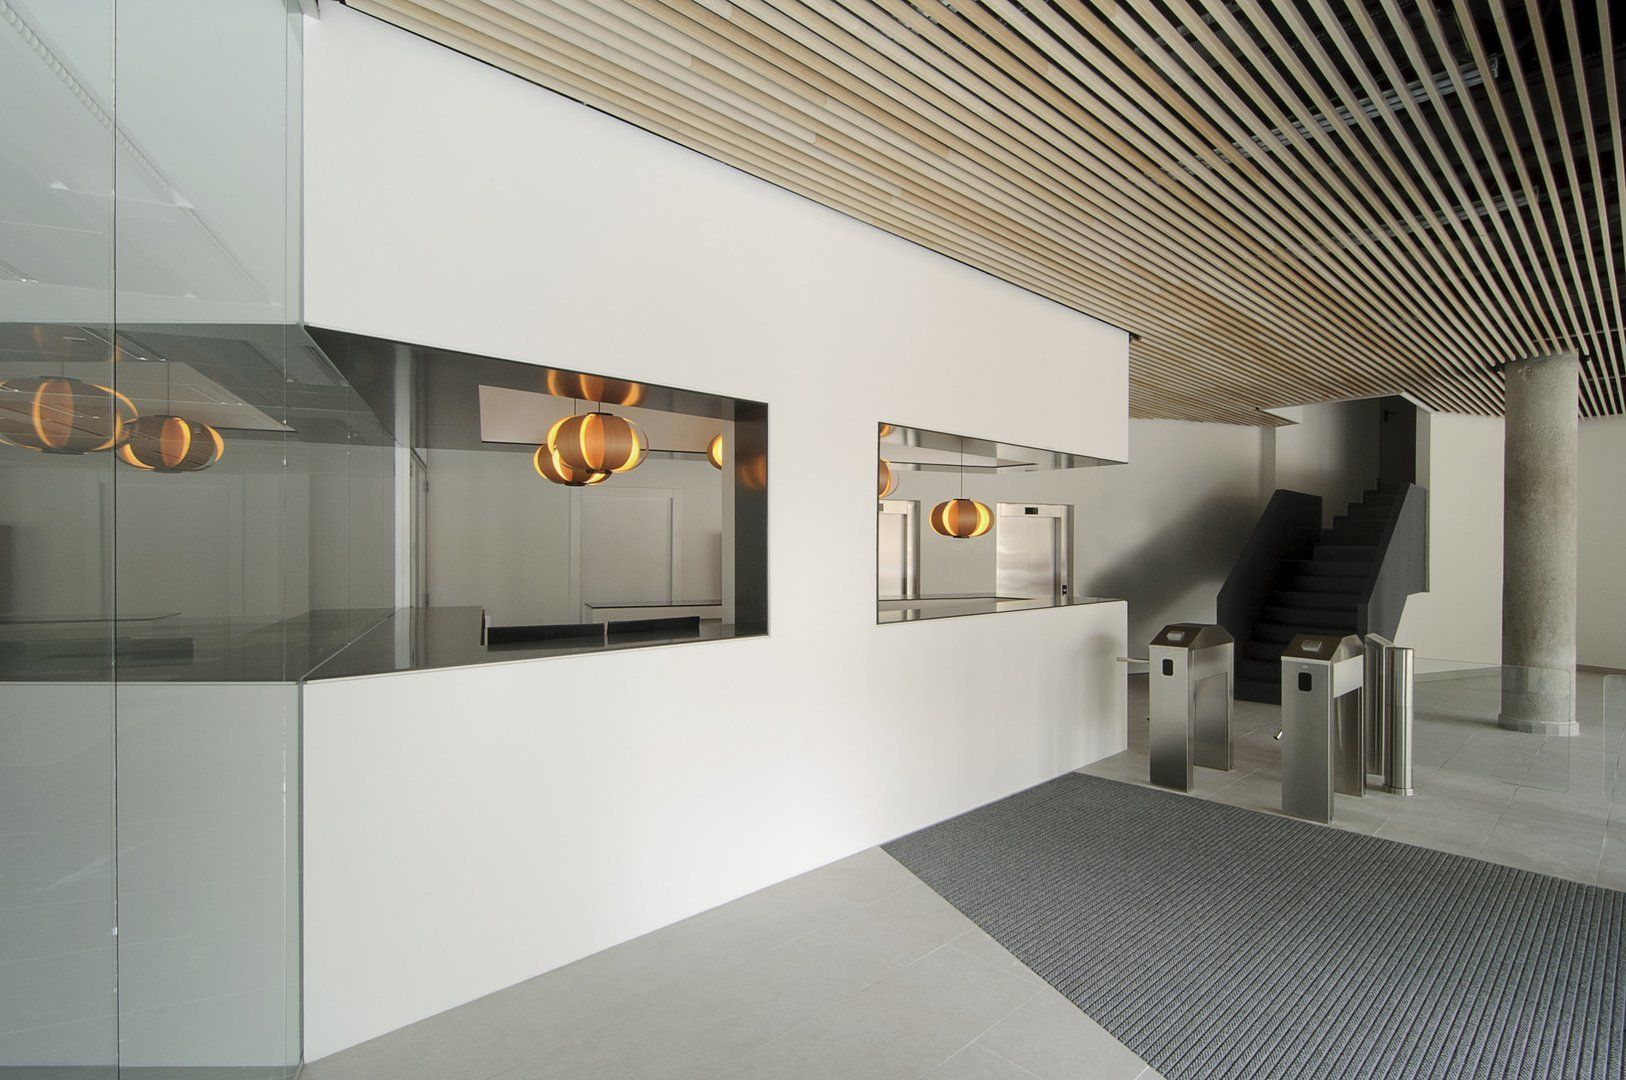 Reforma de edificio de oficinas en bilbao arqa for Oficinas caixa bilbao